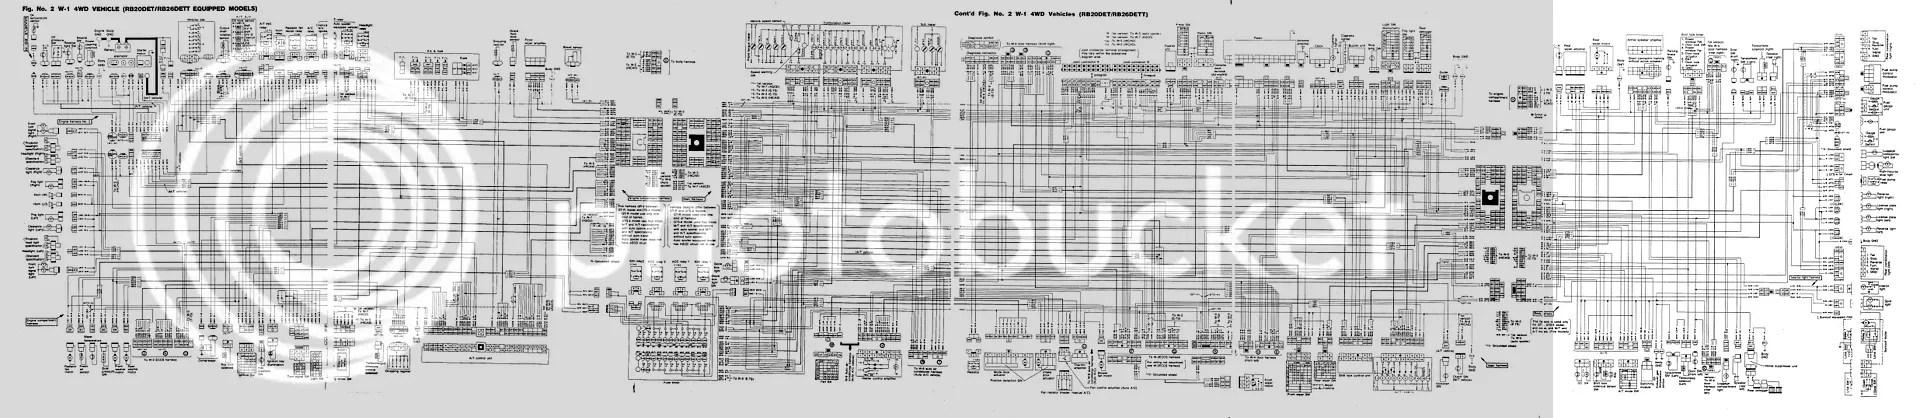 r33 gtst ecu wiring diagram excel swim lane template editable r32 gtr great installation of additionally nissan skyline 4age 16v corolla